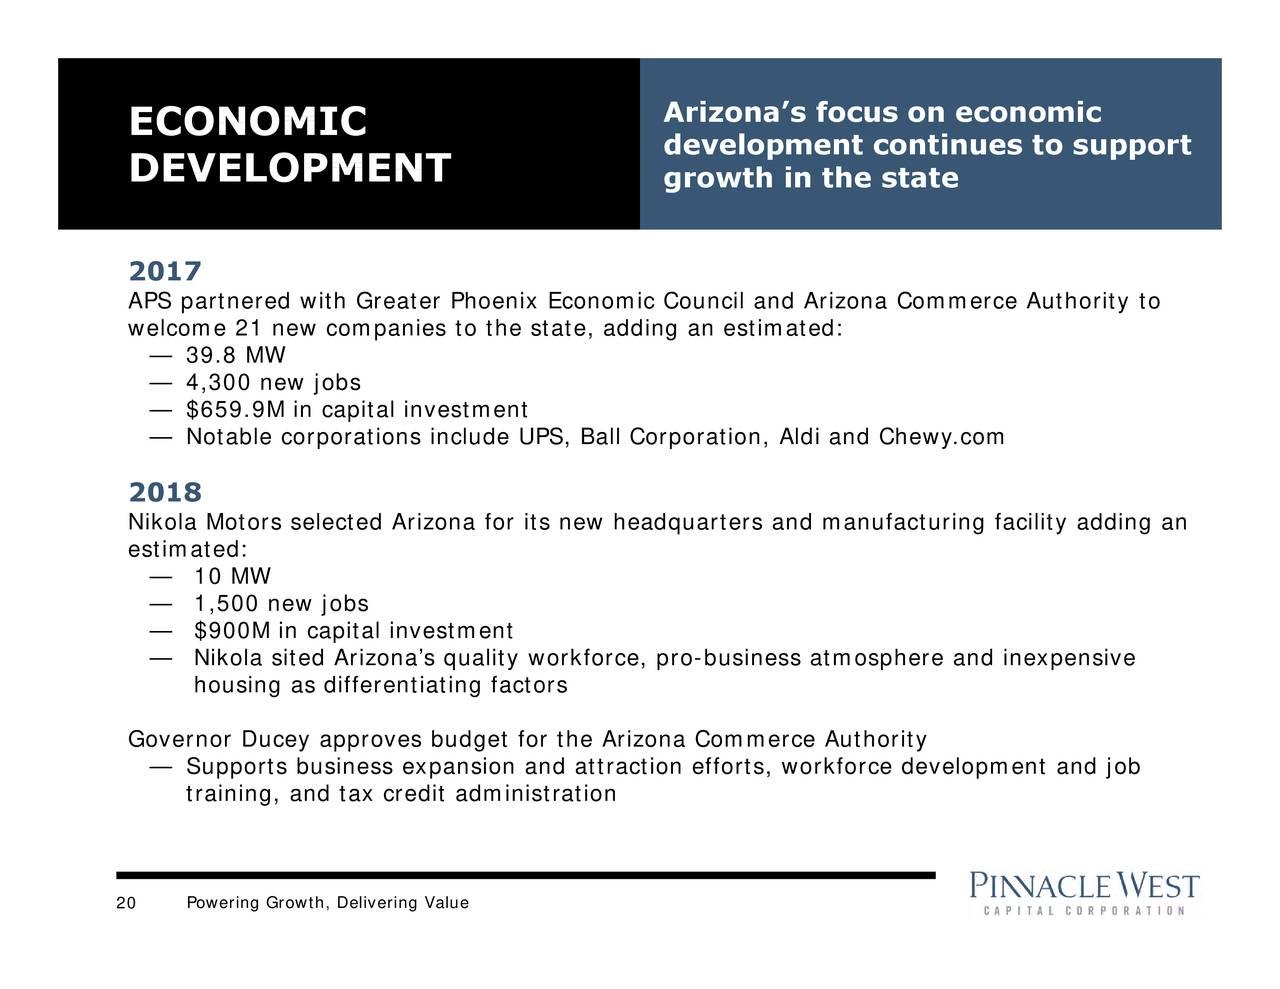 Pinnacle West Capital (PNW) Investor Presentation - Slideshow - Pinnacle  West Capital Corporation (NYSE:PNW) | Seeking Alpha